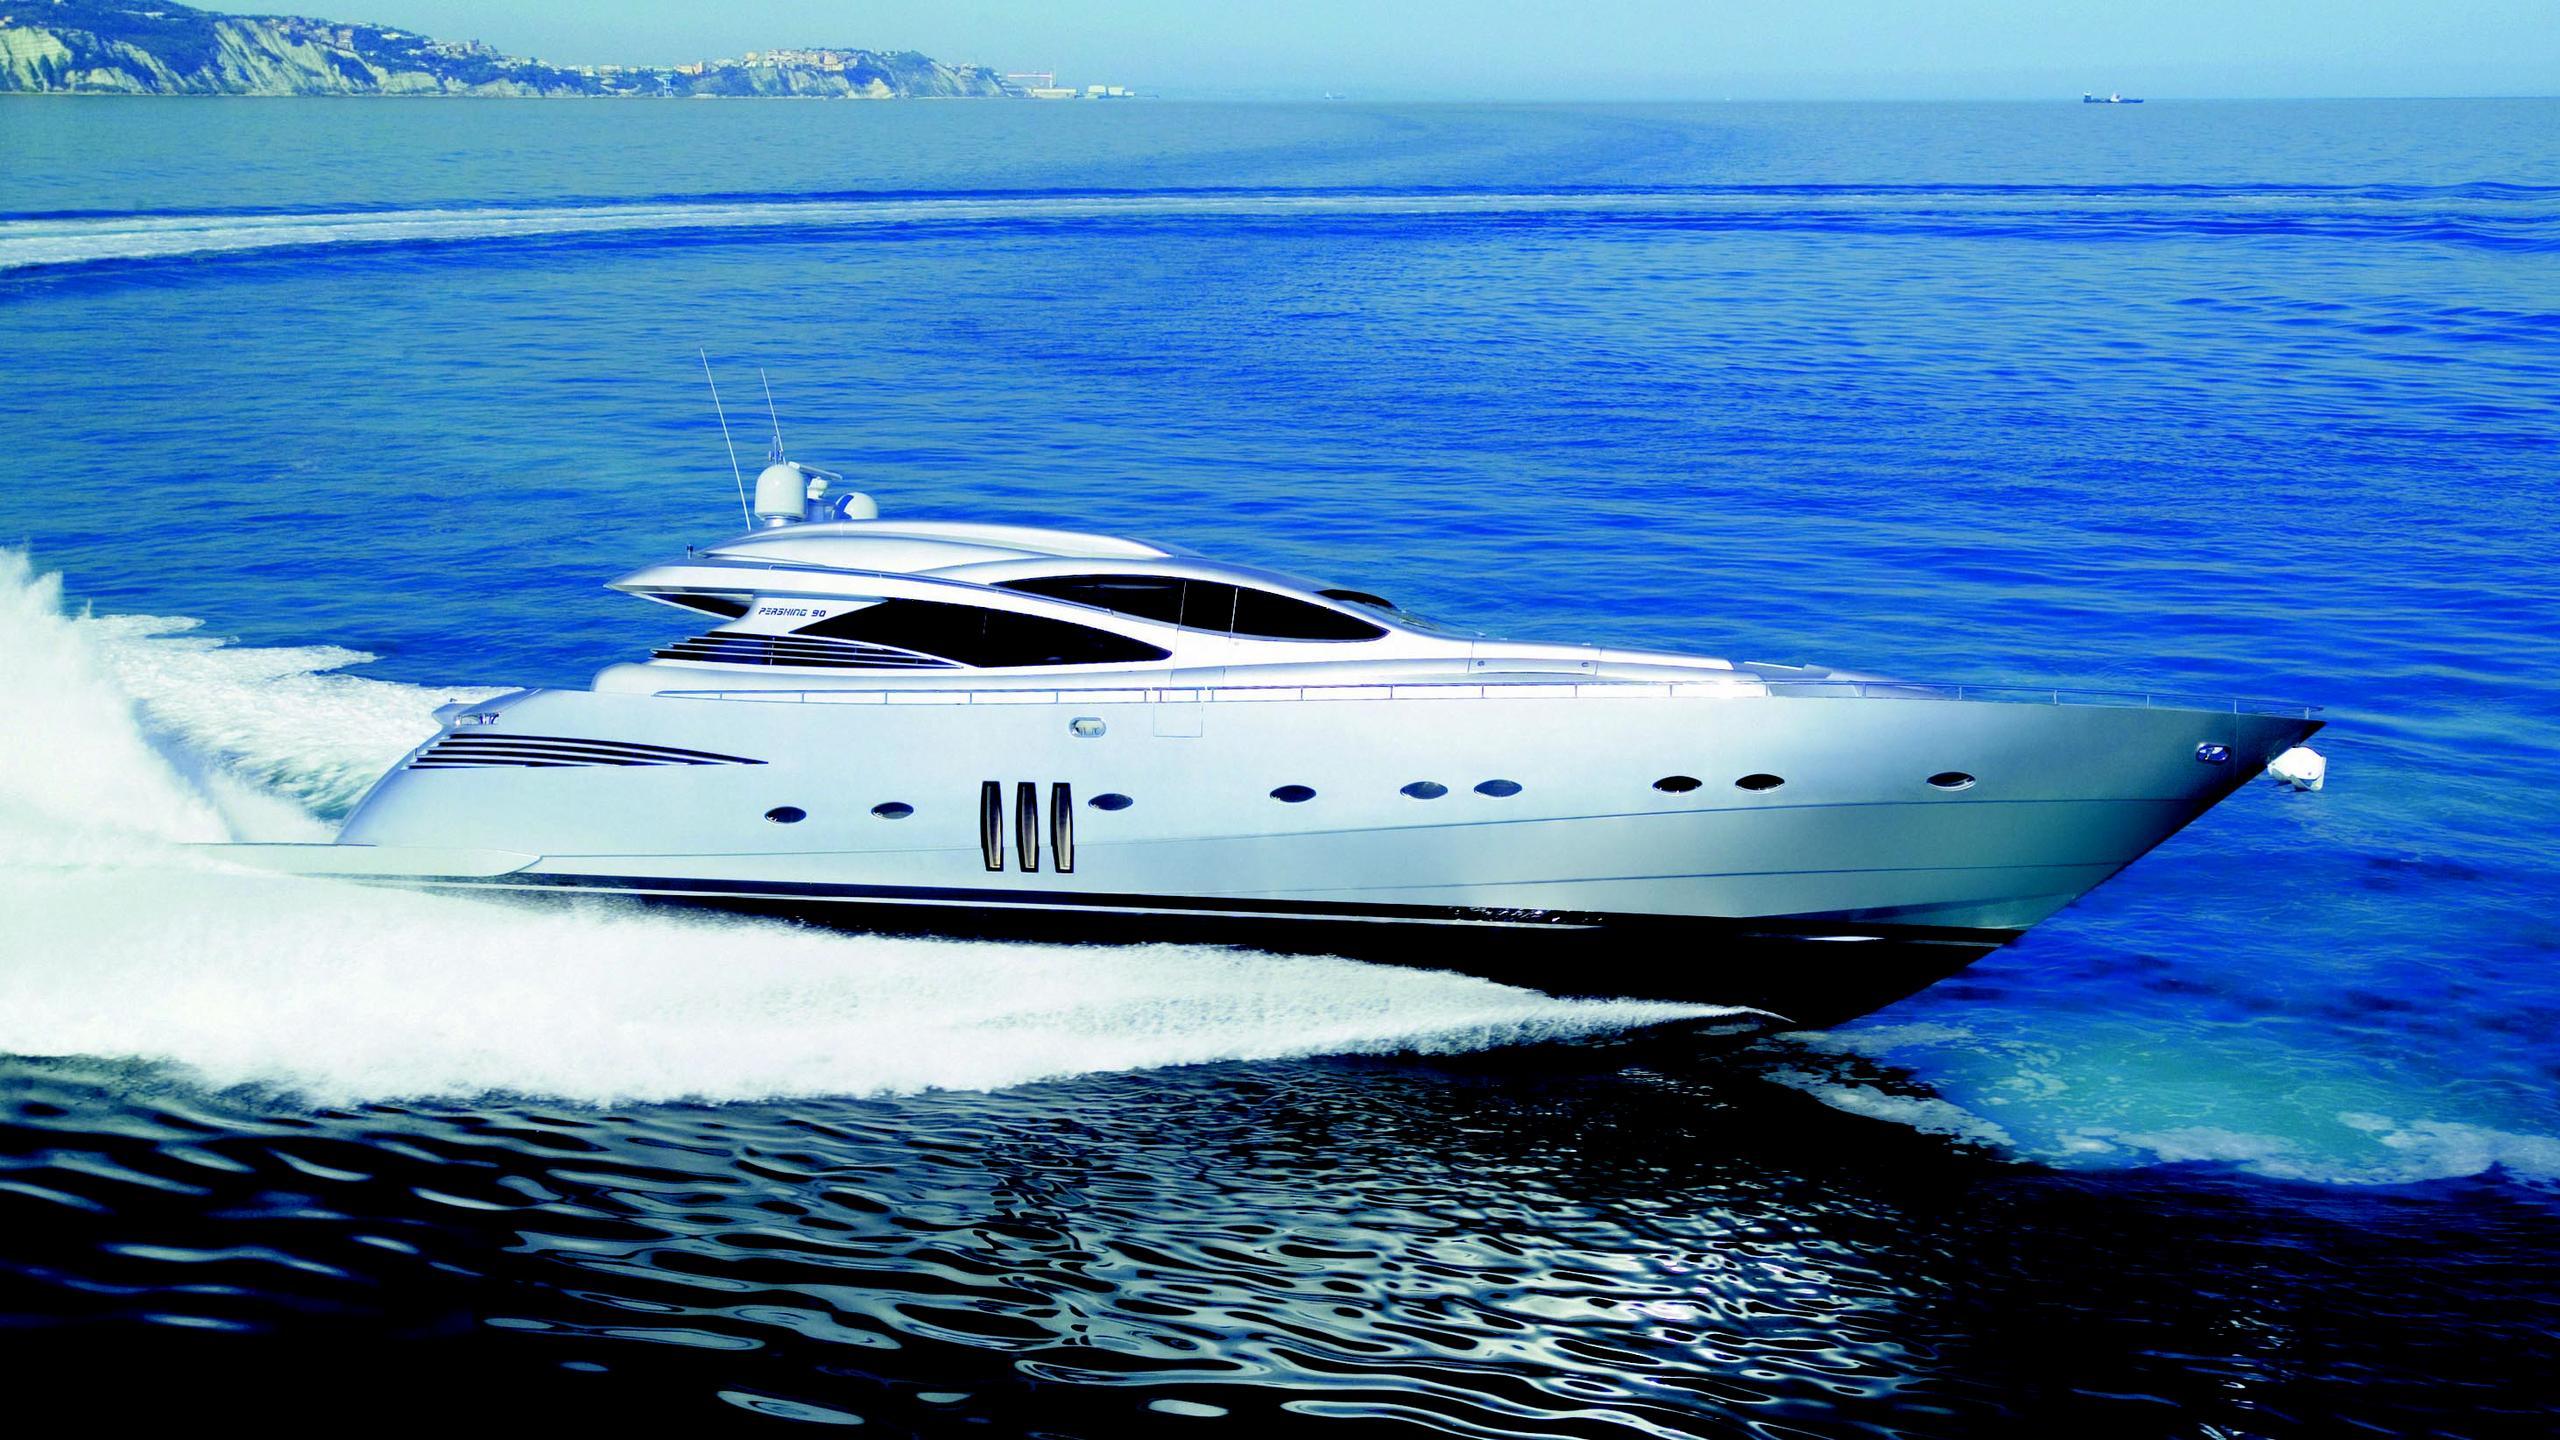 zeus-motor-yacht-pershing-90-2007-27m-cruising